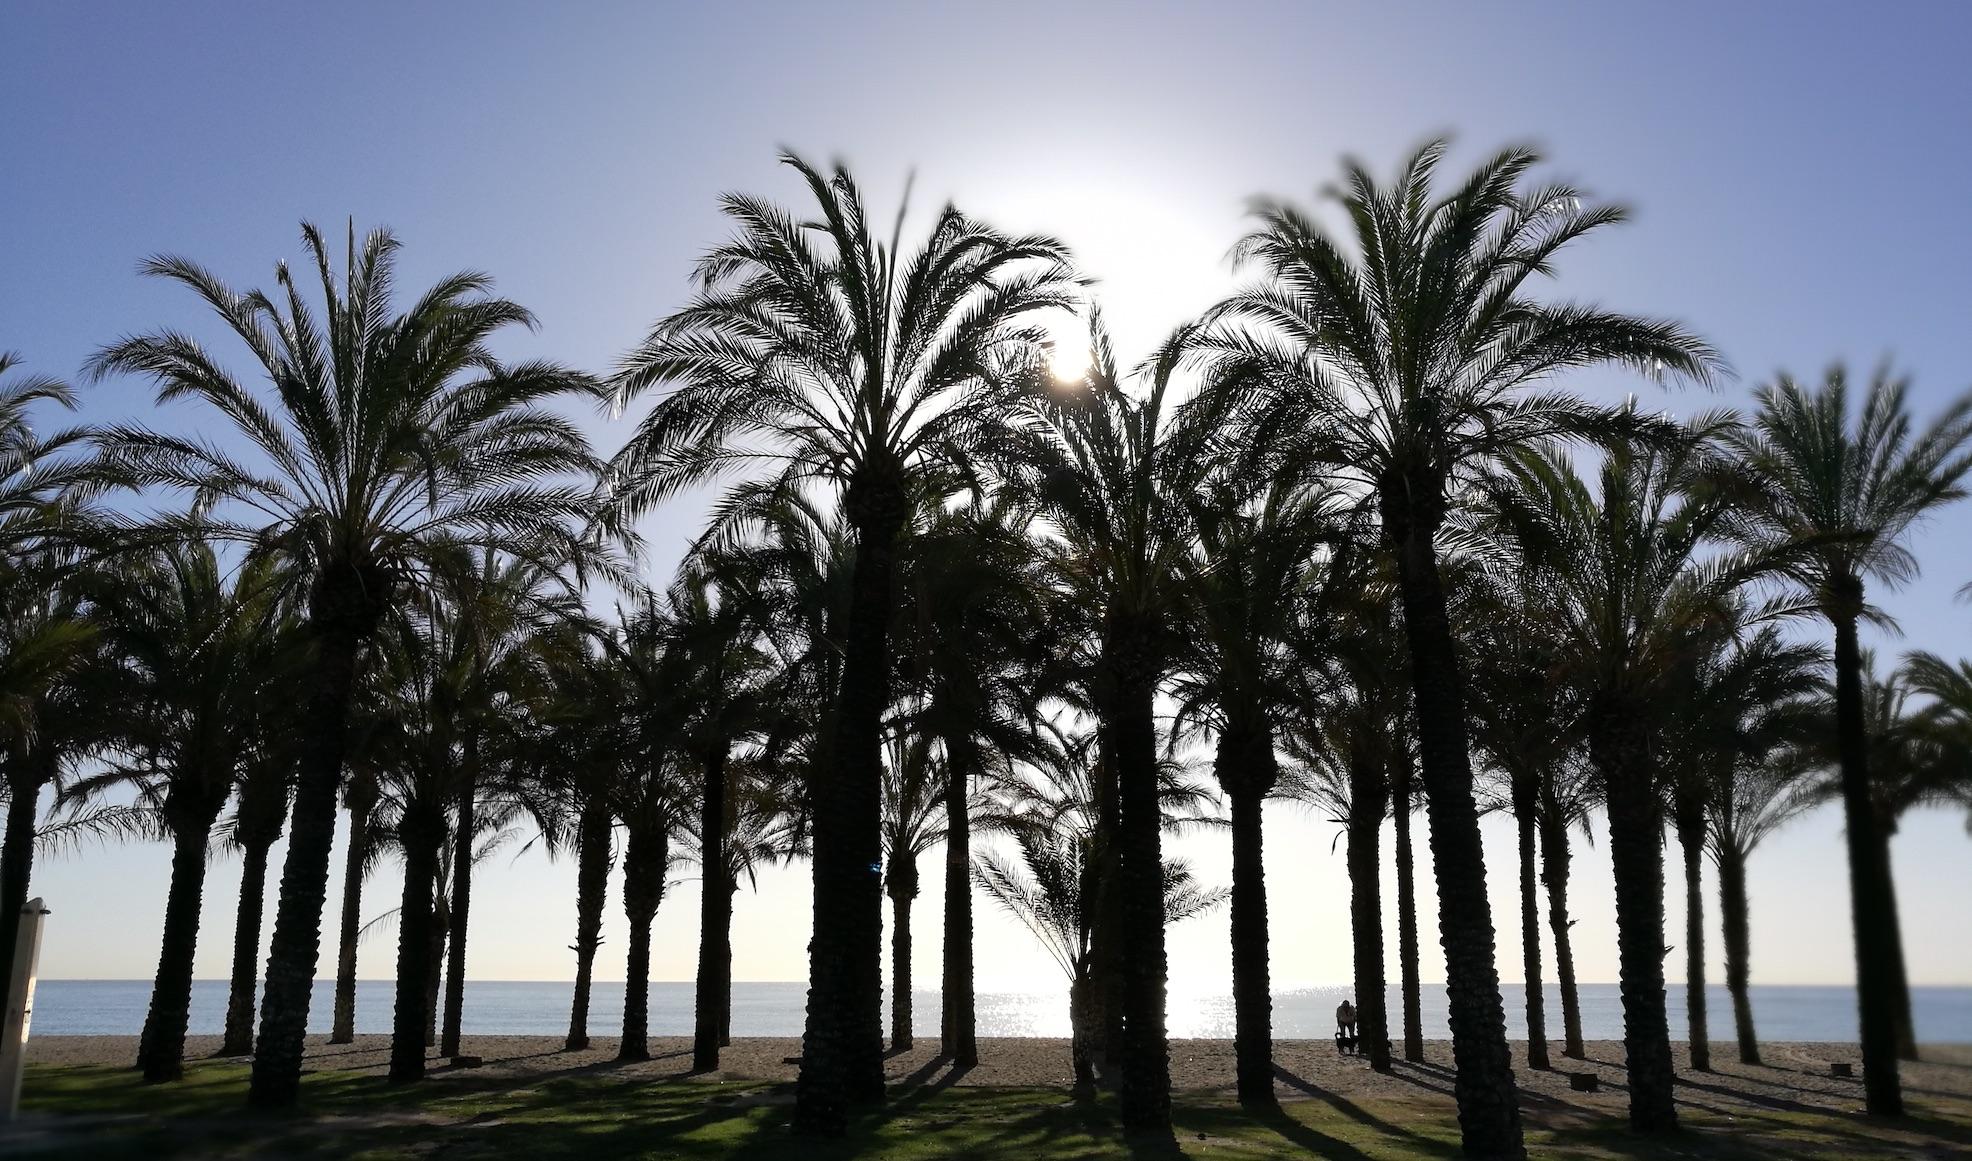 Torremolinos, Malaga